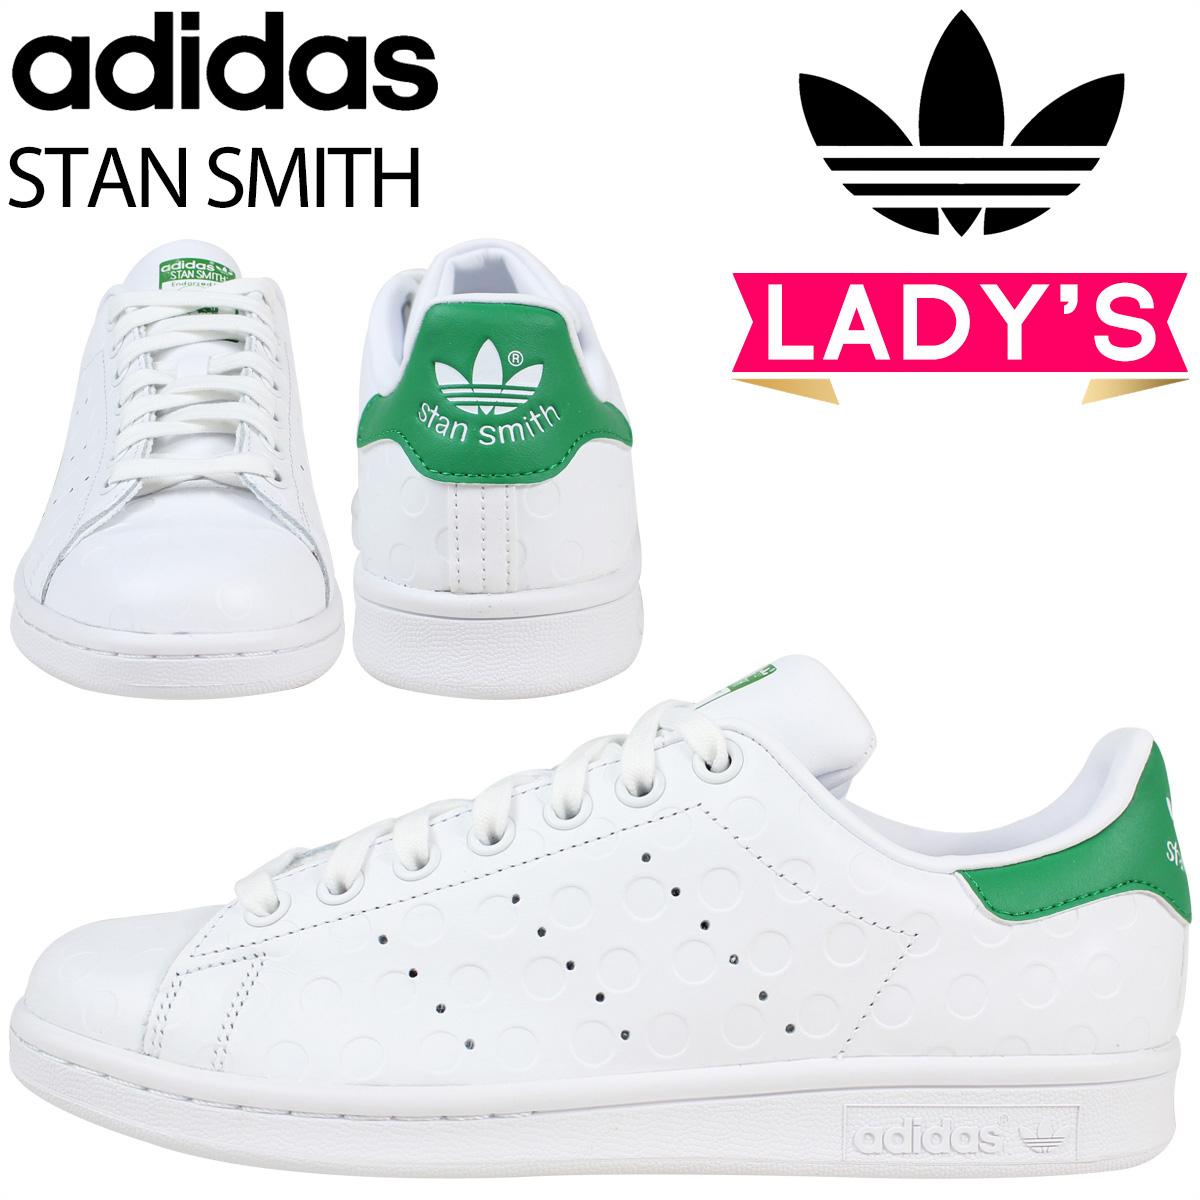 adidas stan smith womens